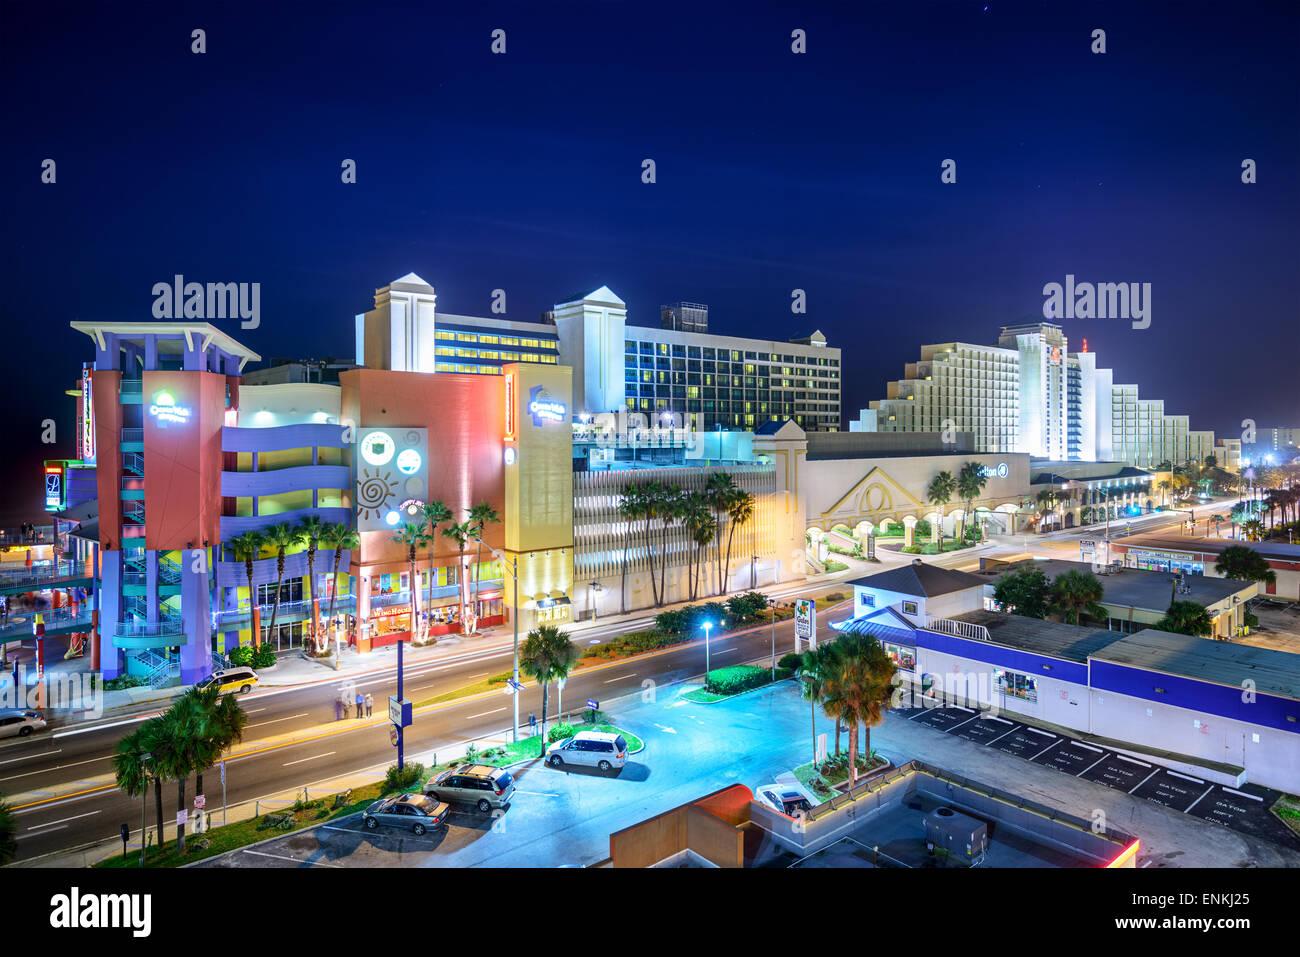 Daytona Beach, Florida, USA hotels and shops. - Stock Image